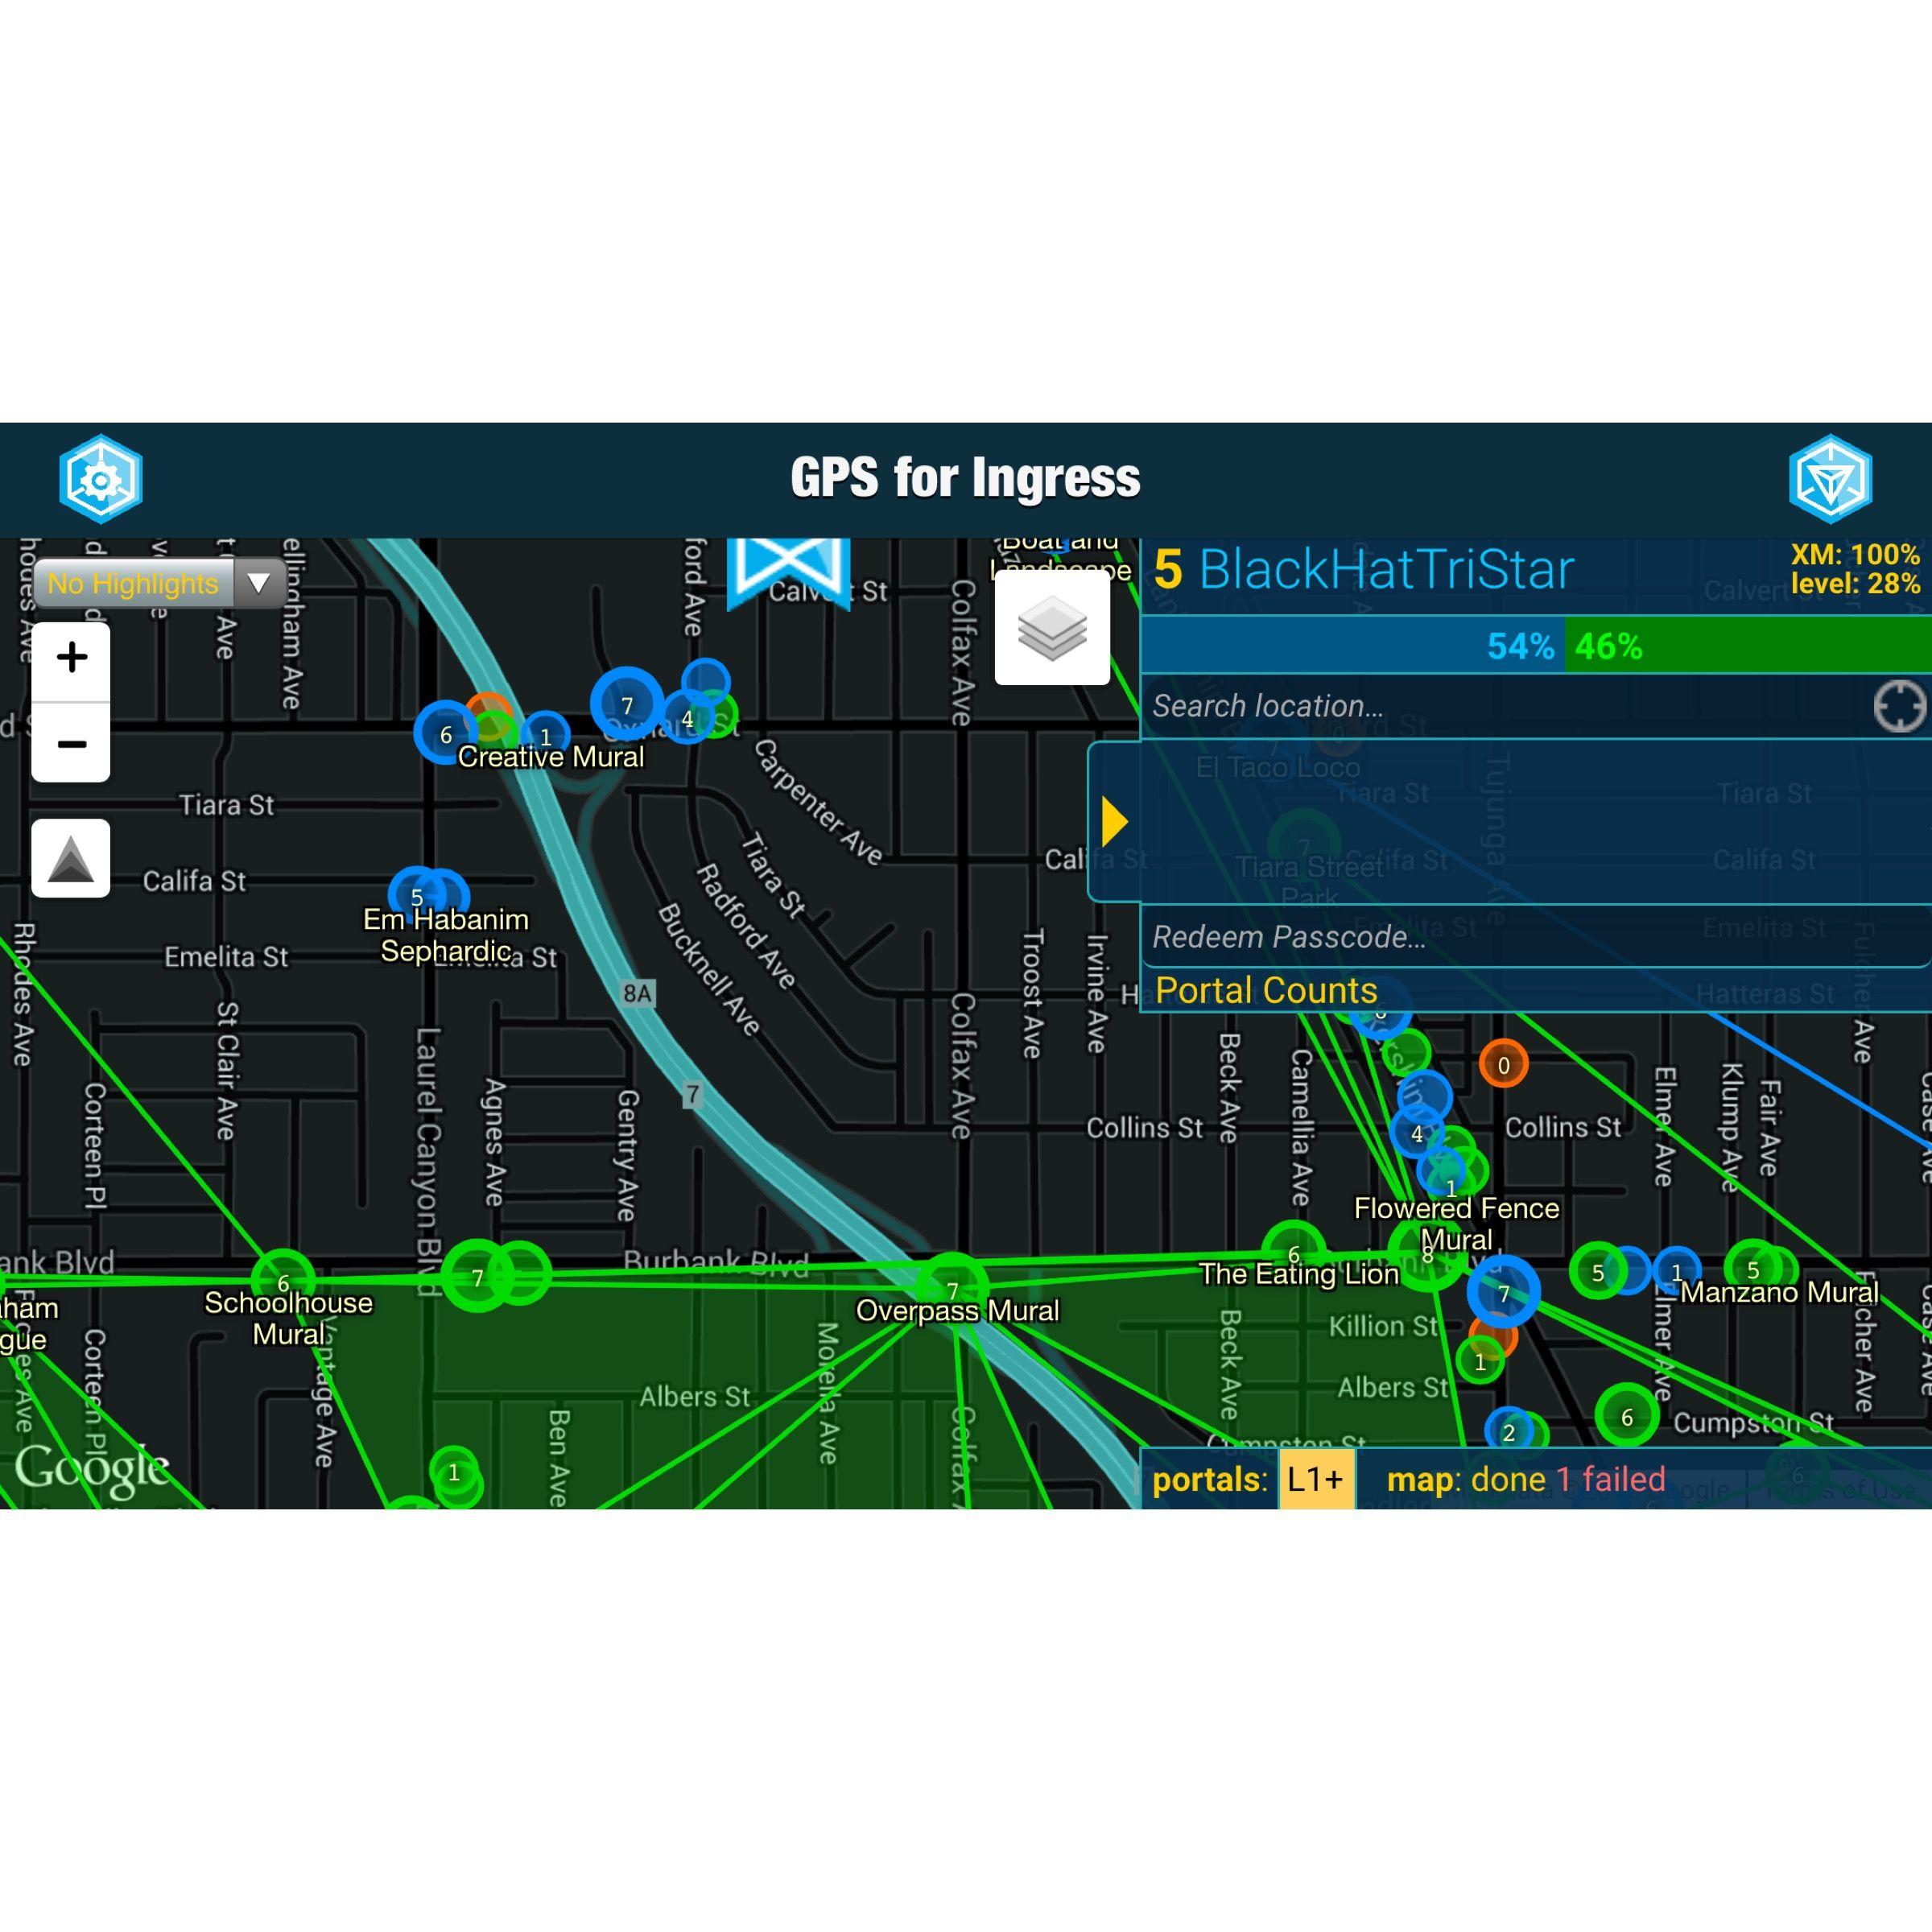 ingress #resistance #enlightened #gpsforingress ... on success map, intelligence world map, fire emblem awakening map, eclipse map, iris map, seattle center area map, abilene ks map, nineteen eighty-four map, the last of us map, show address on map, oracle map, abilene kansas city map, augmented reality map, egress map, wollongong australia map, grand theft auto v map, java map, scavenger hunt map, google play map,